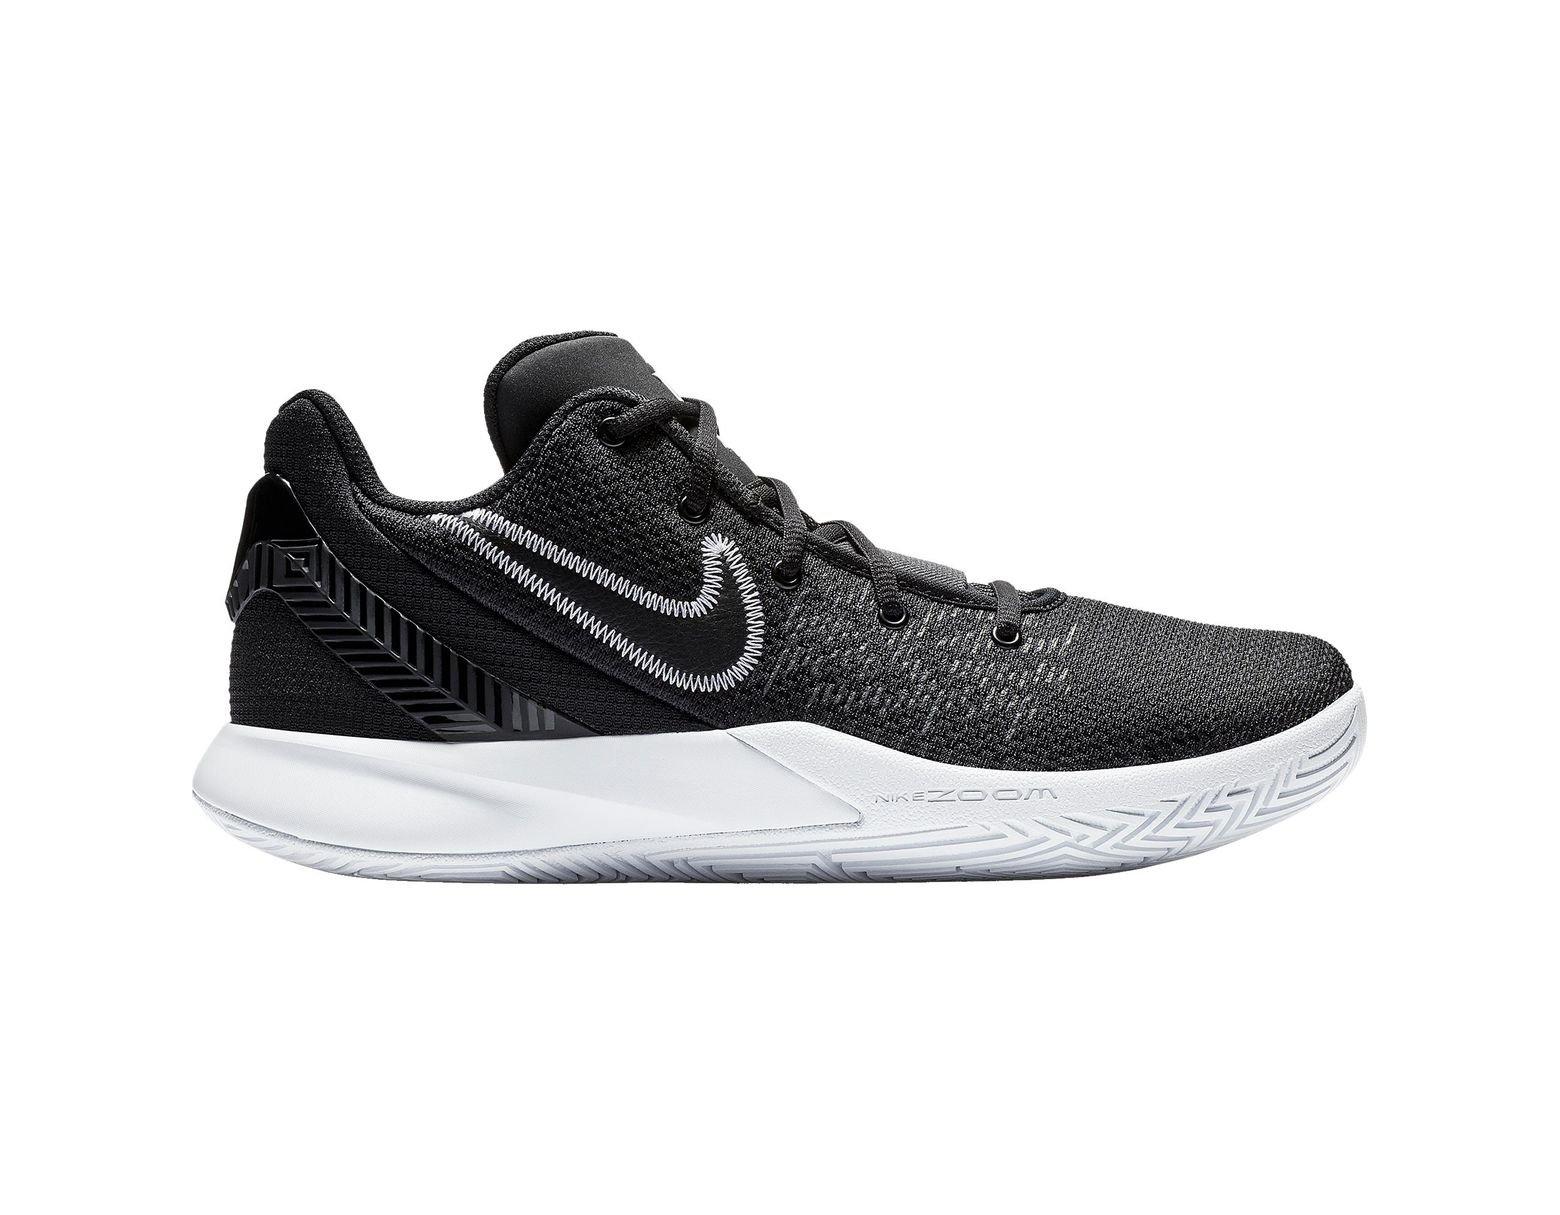 049e642f Nike Kyrie Flytrap 2 Basketball Shoes in Black for Men - Lyst